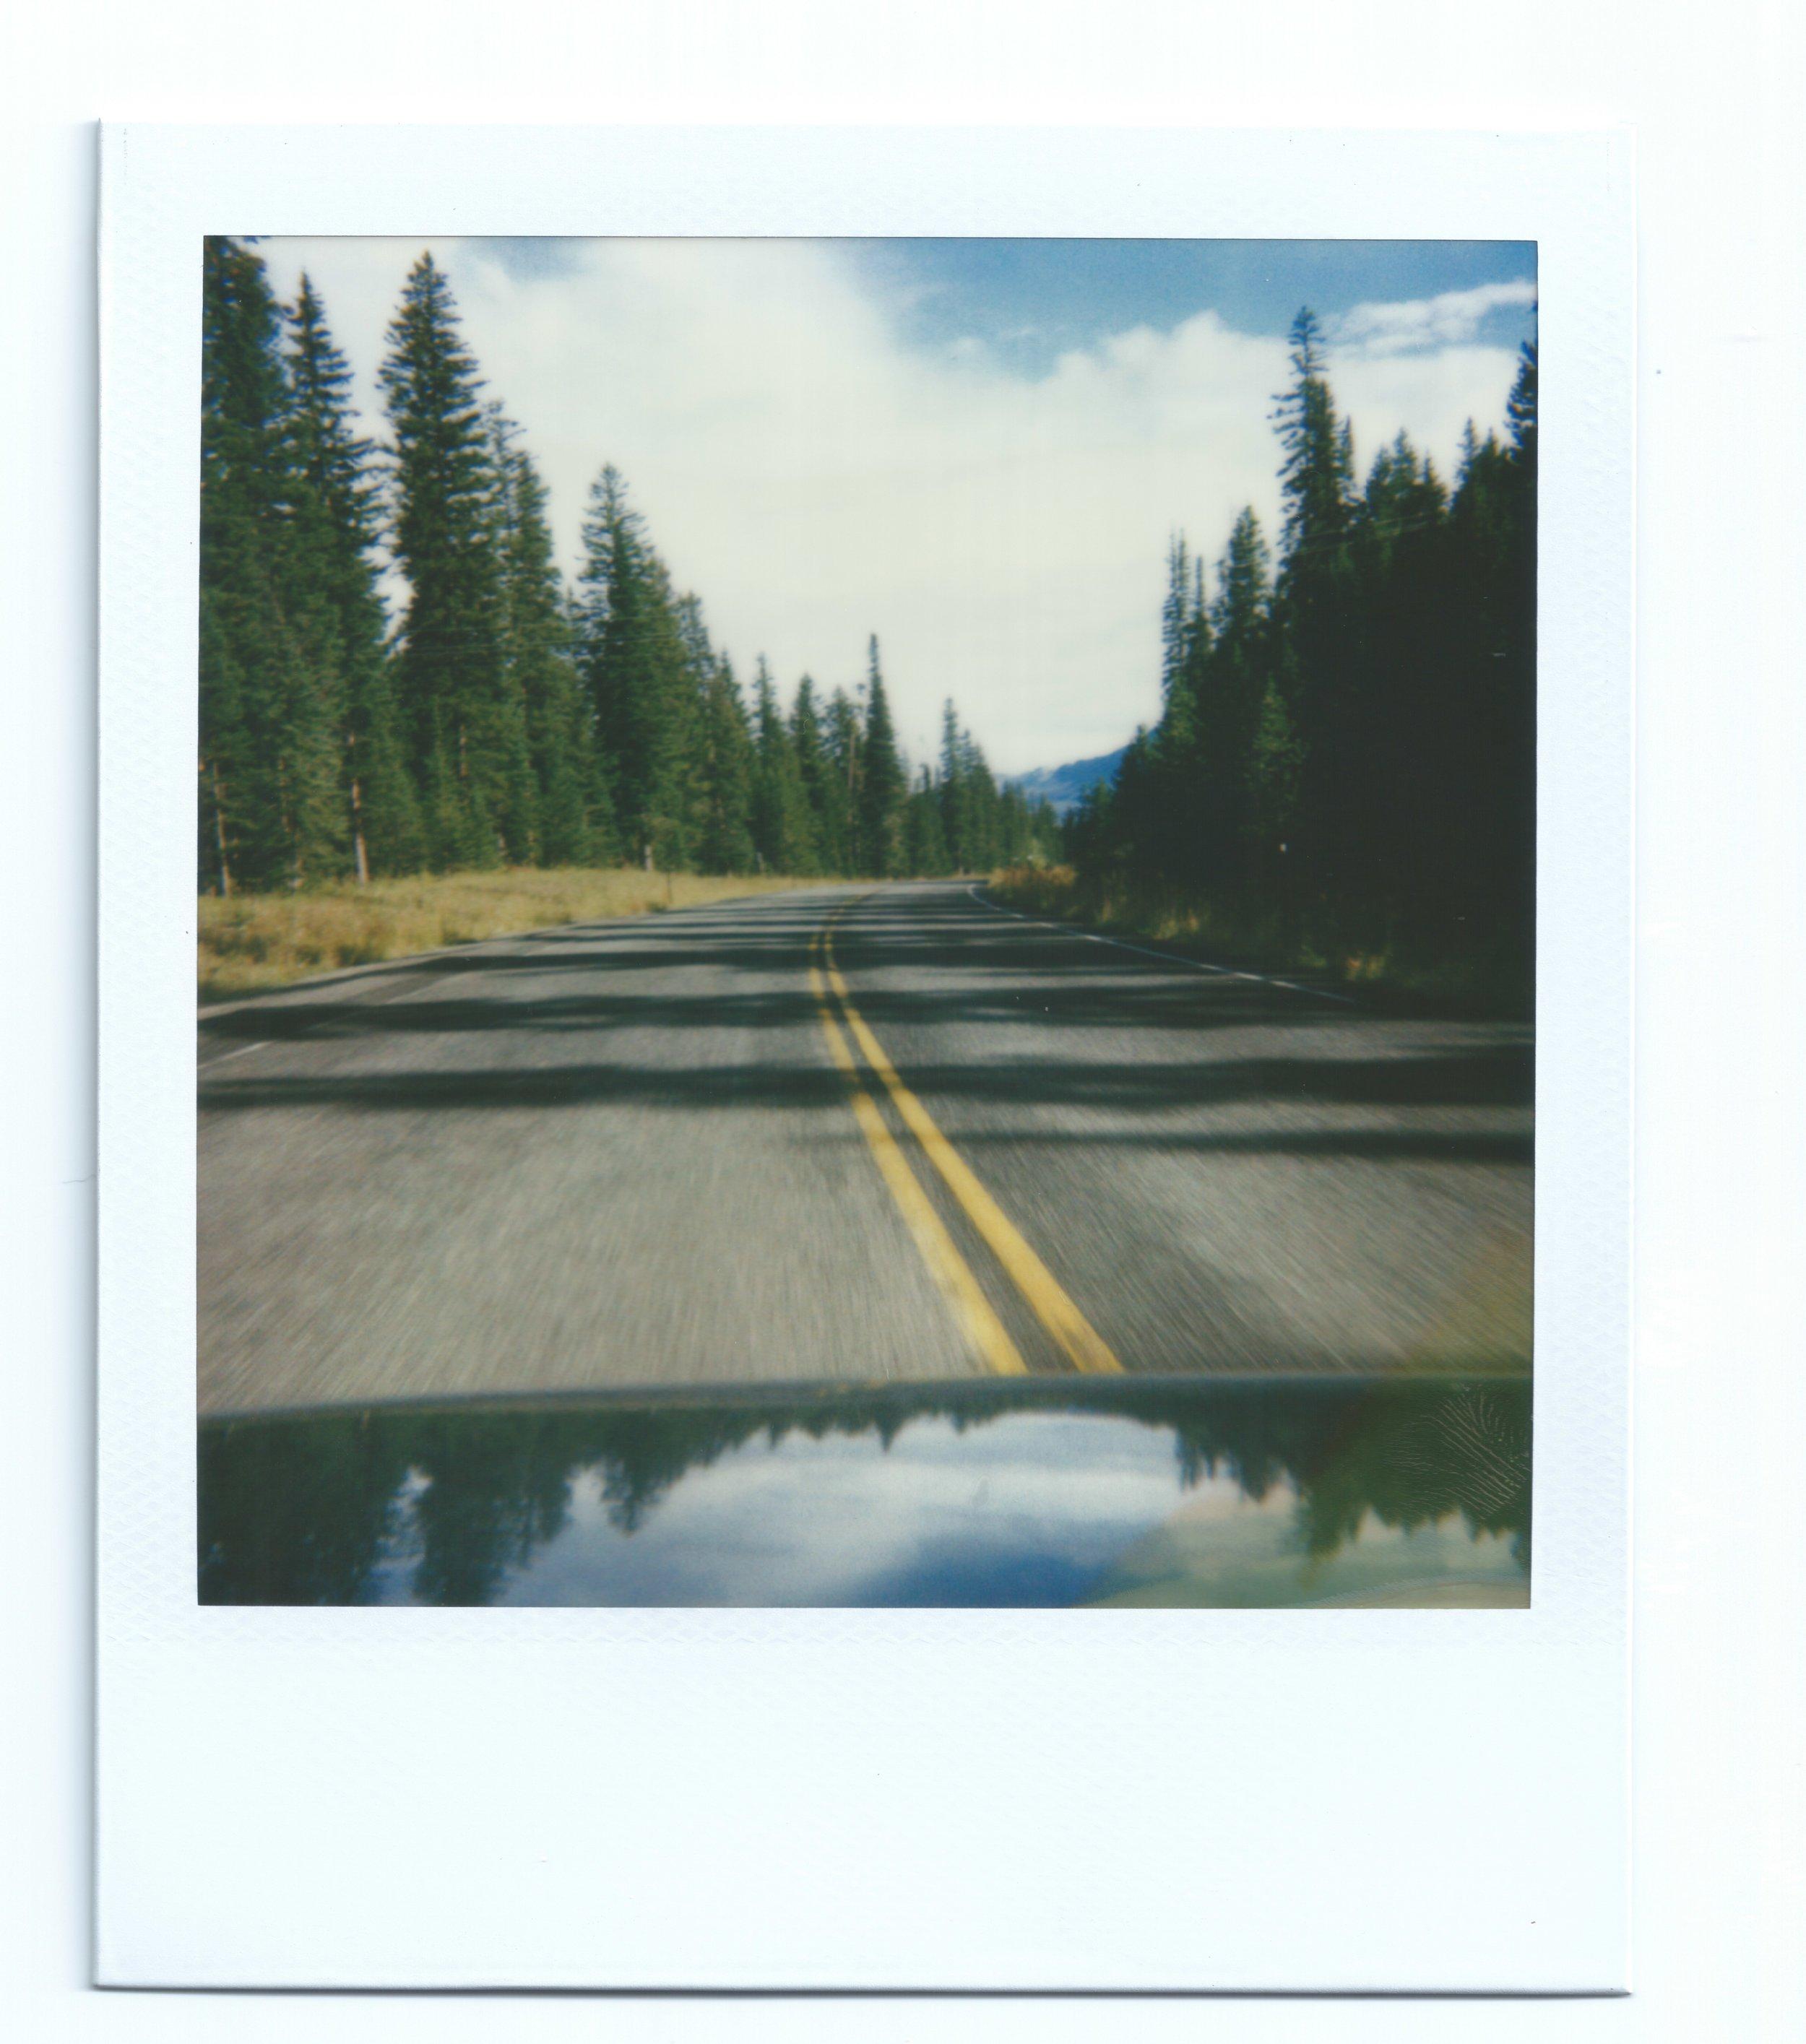 Road_pinetrees2_binder6.jpeg